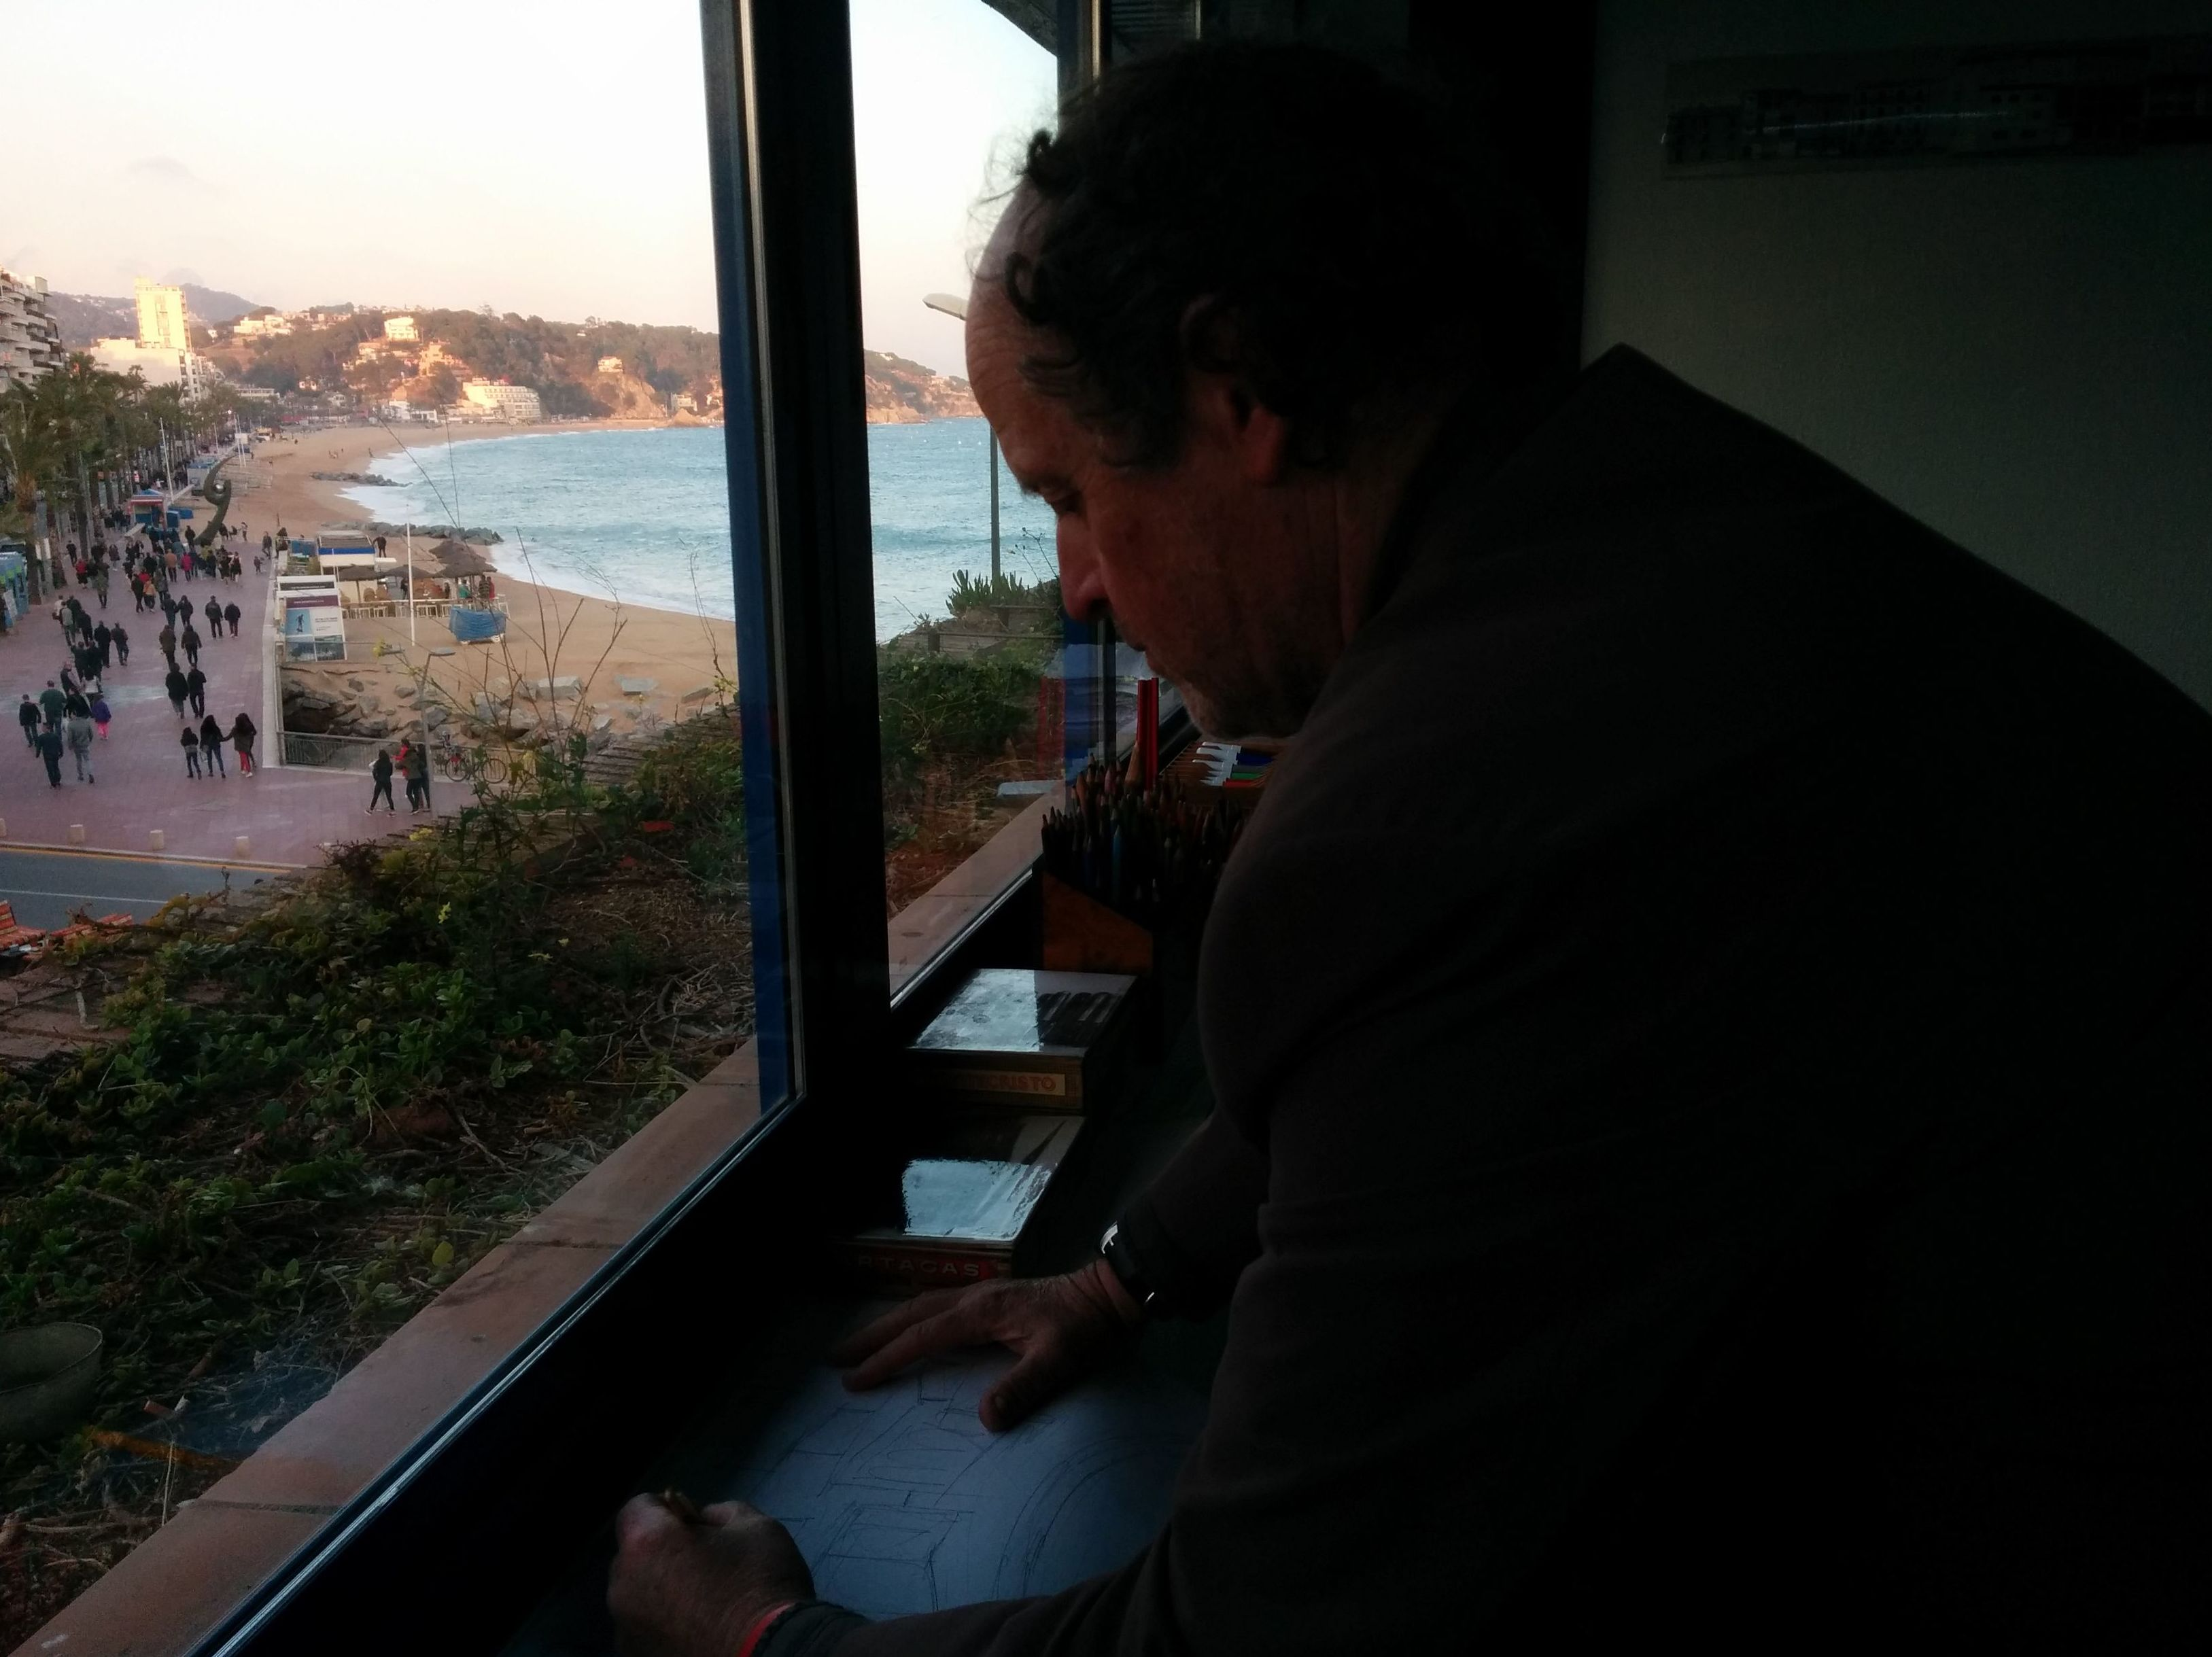 Foto 17 de Arquitectos en Lloret de Mar | Jaume Montfort Romagosa